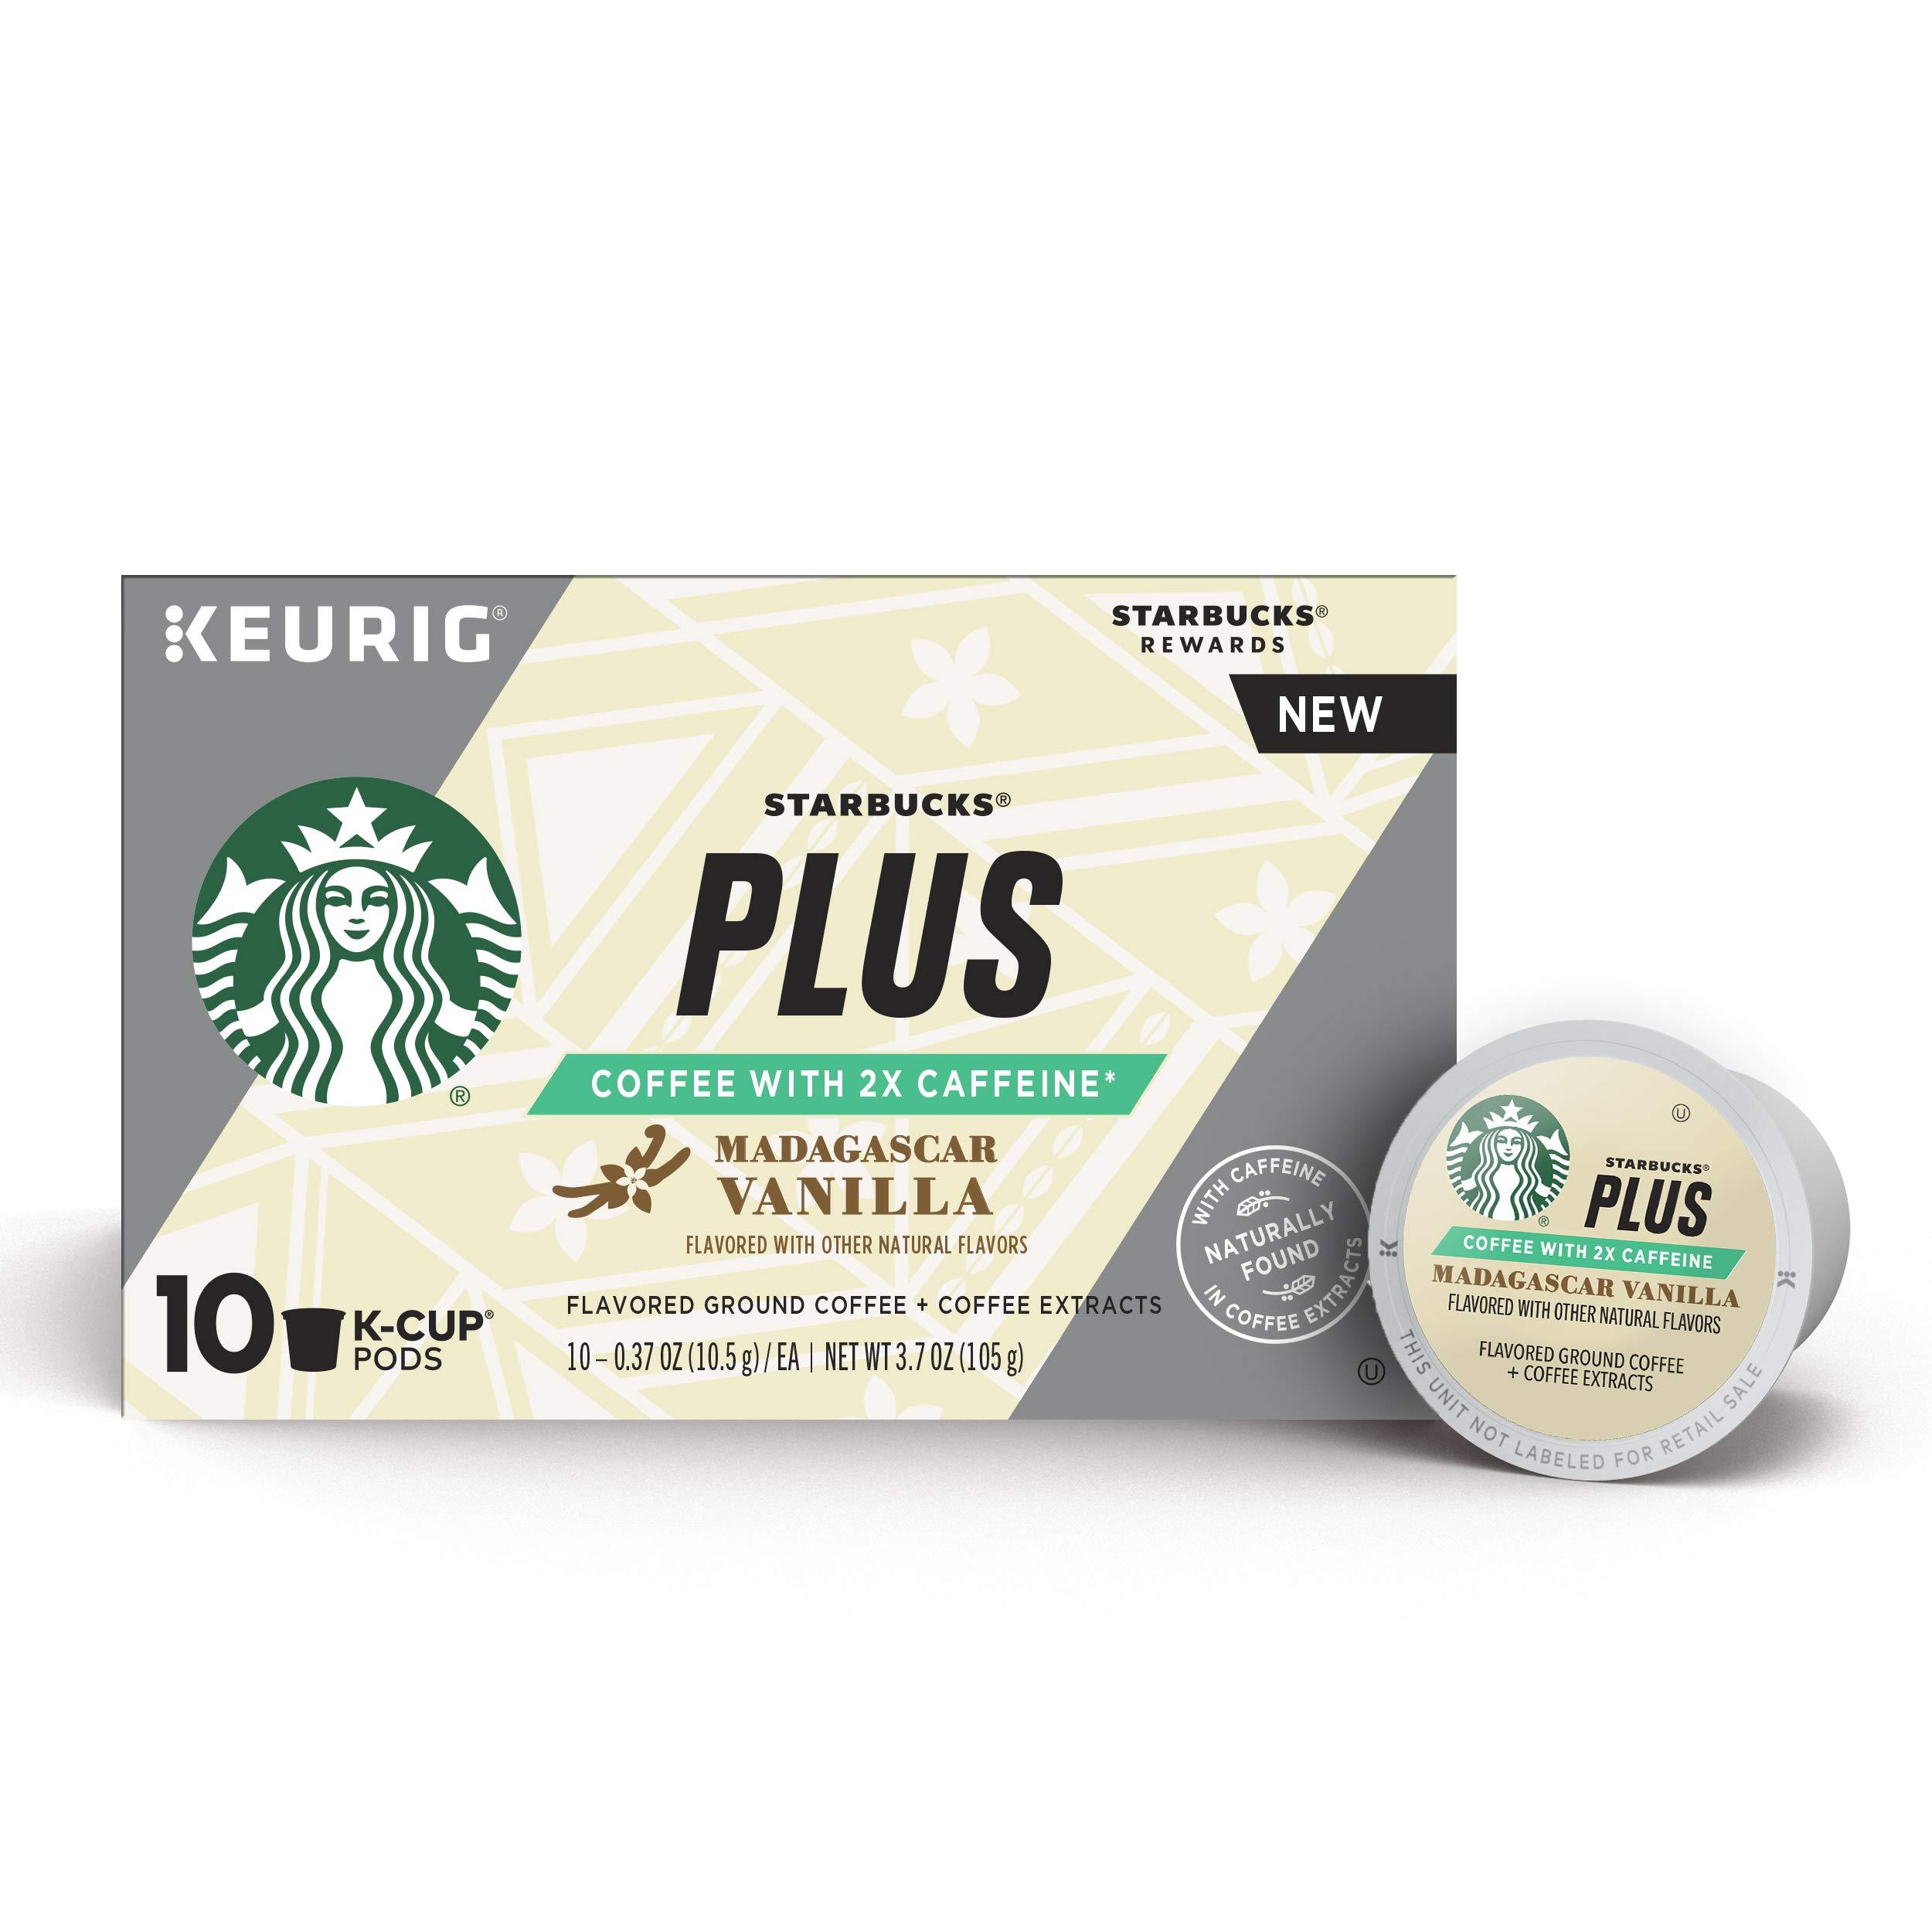 96152ae2e9d Starbucks Plus Madagascar Vanilla Single Cup Coffee for Keurig ...